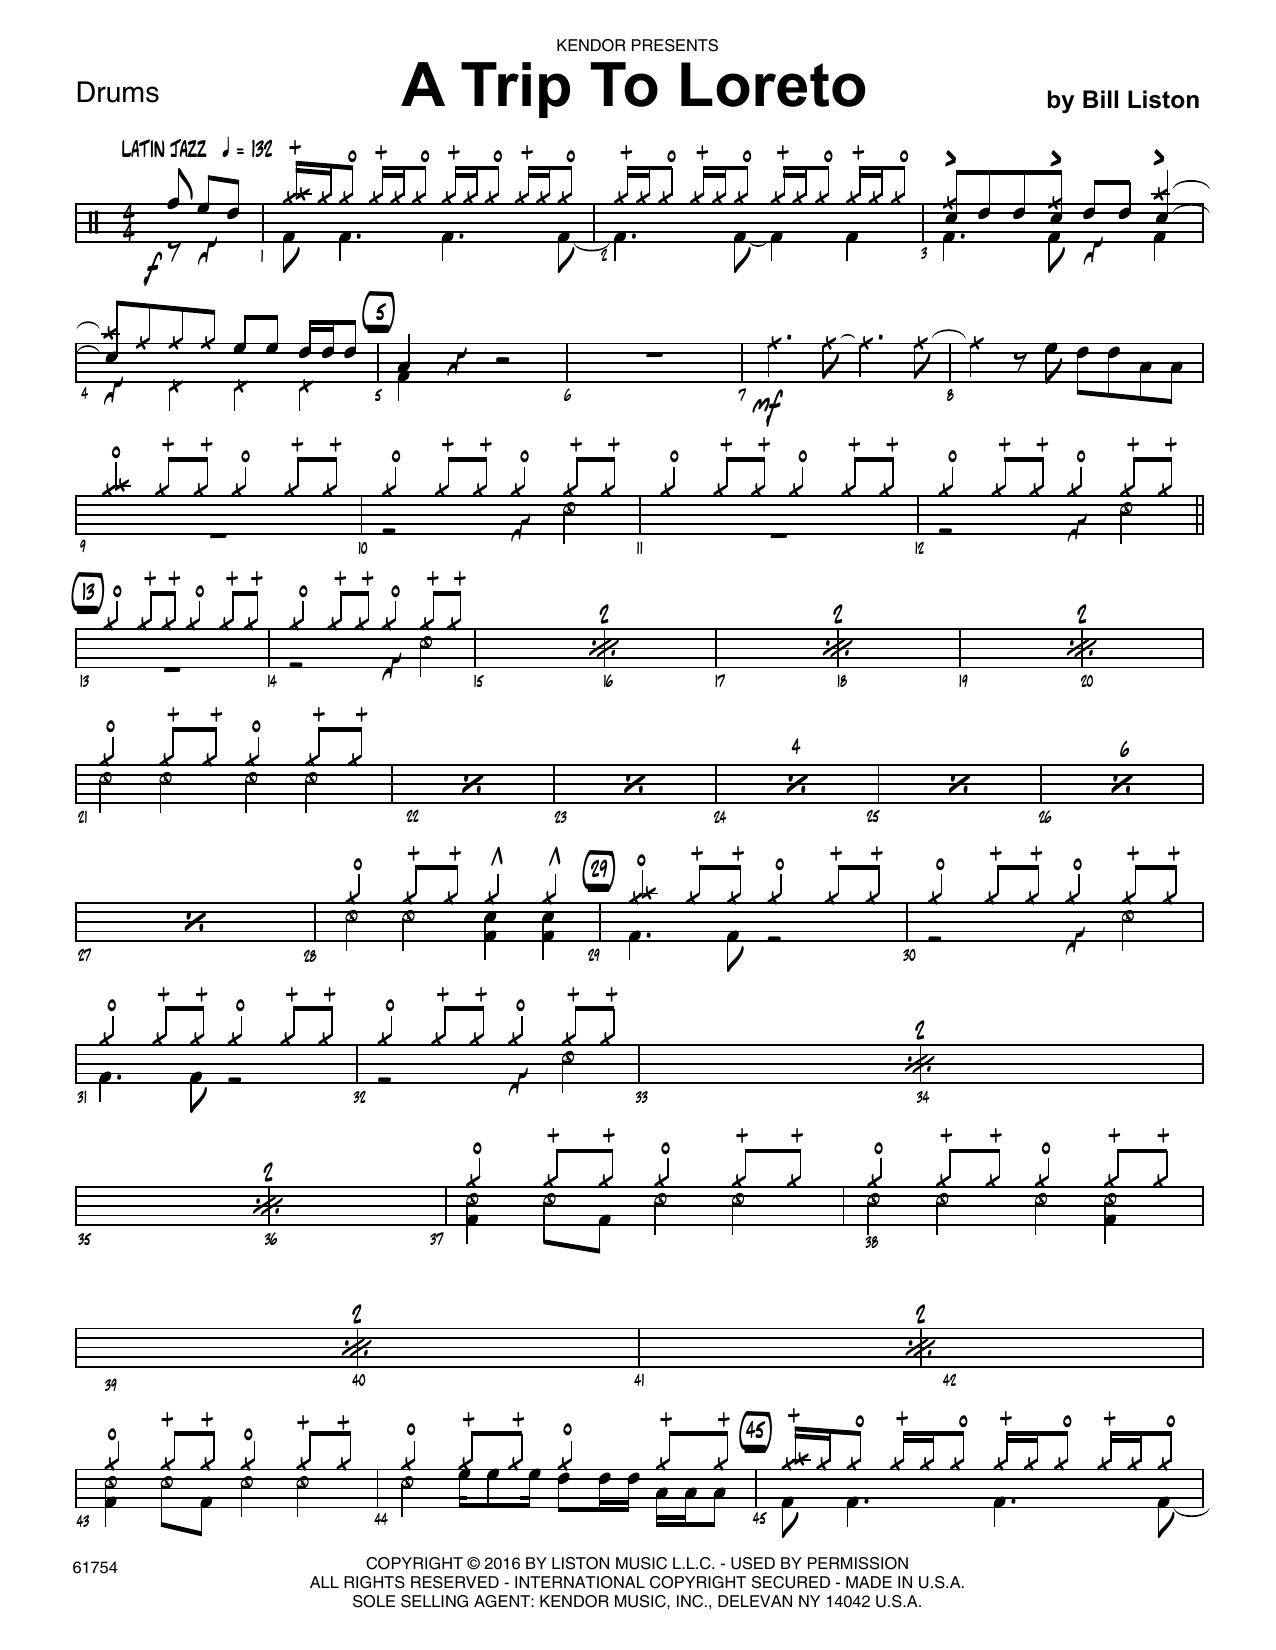 A Trip To Loreto - Drum Set Sheet Music